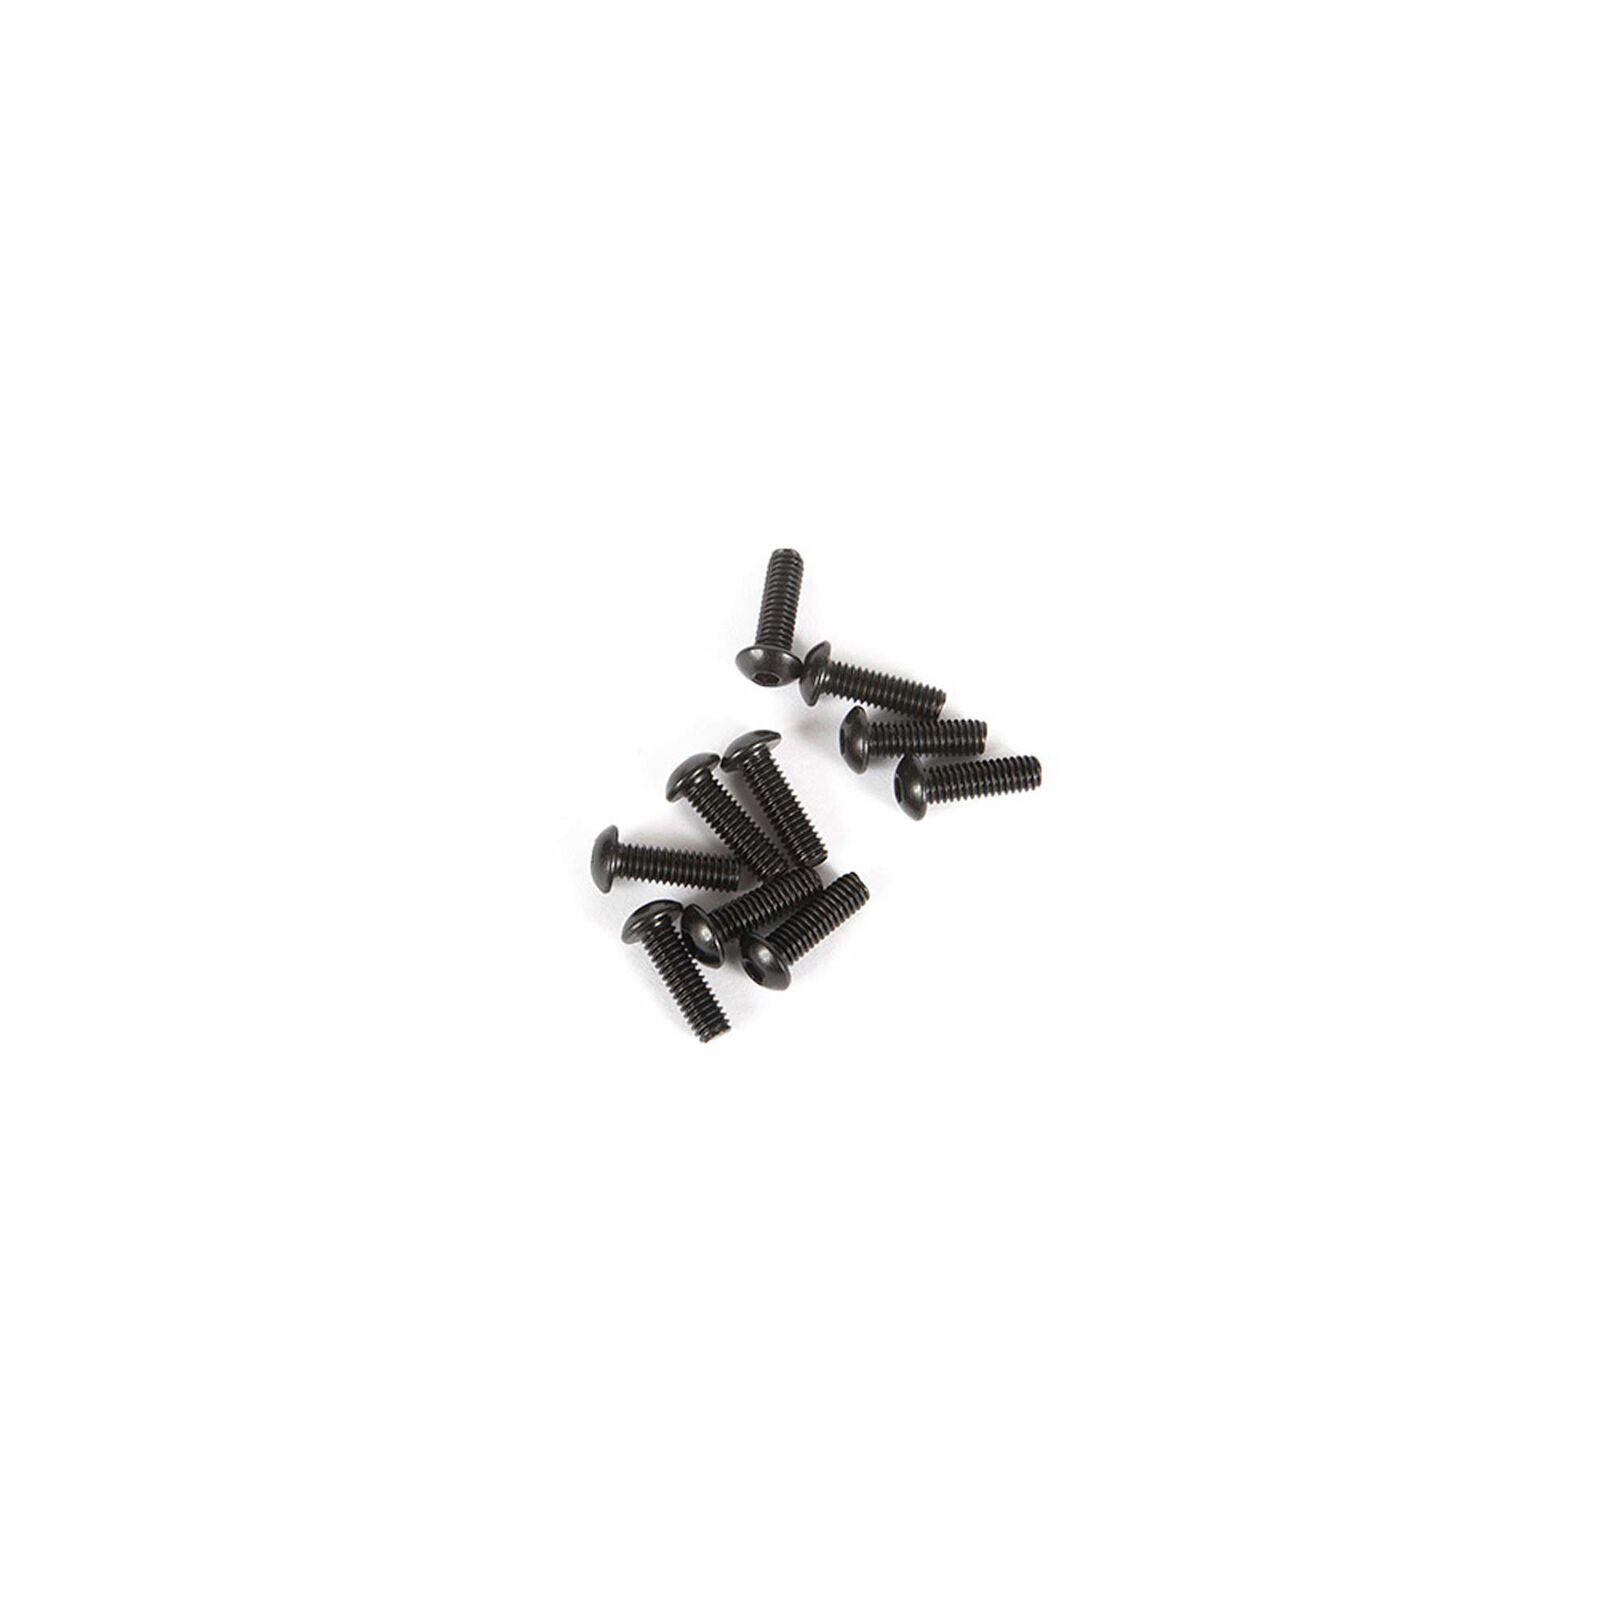 M2.5 x 8mm Button Head Screw (10)